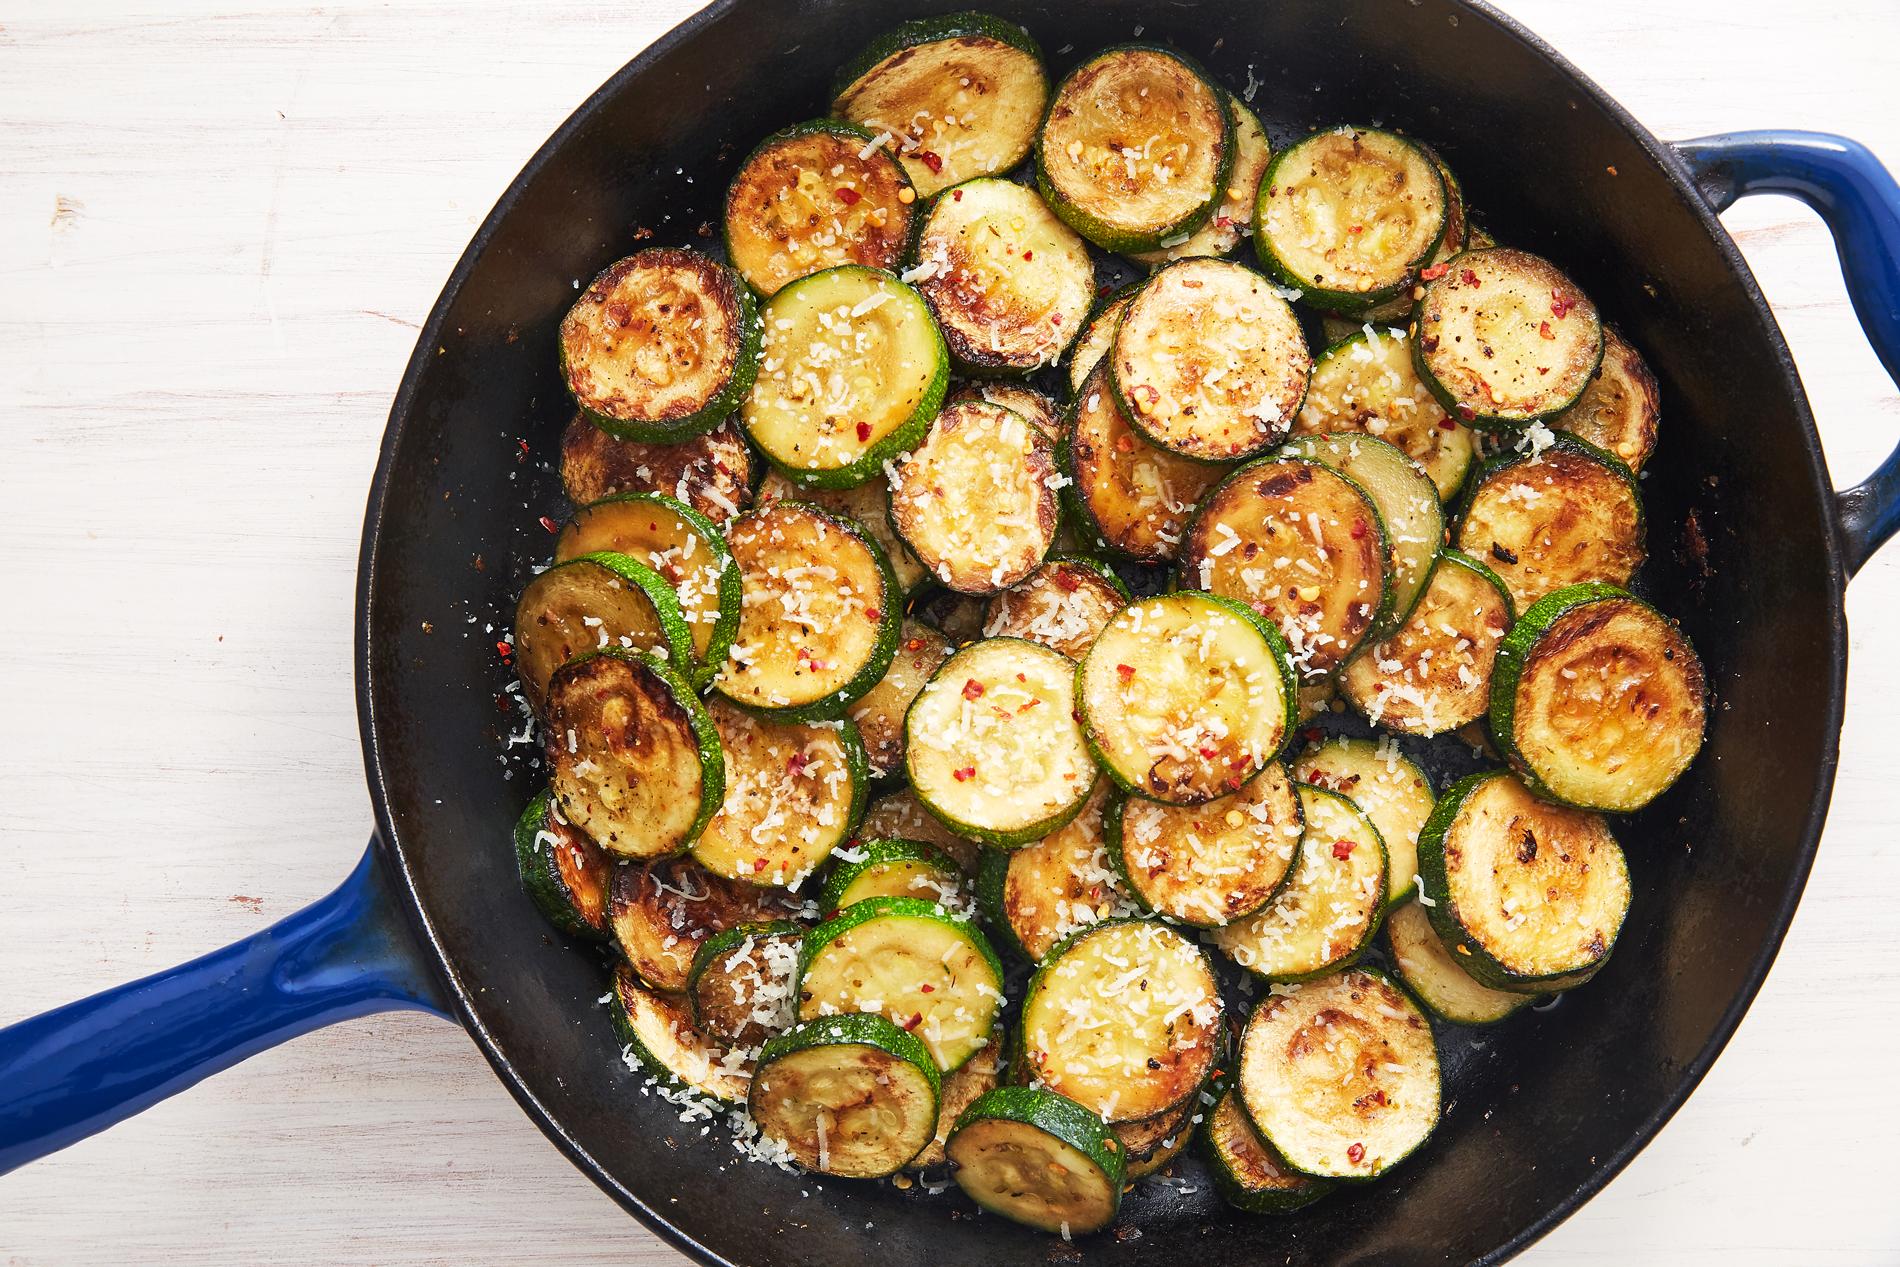 Best Sauteed Zucchini Recipe How To Make Sauteed Zucchini